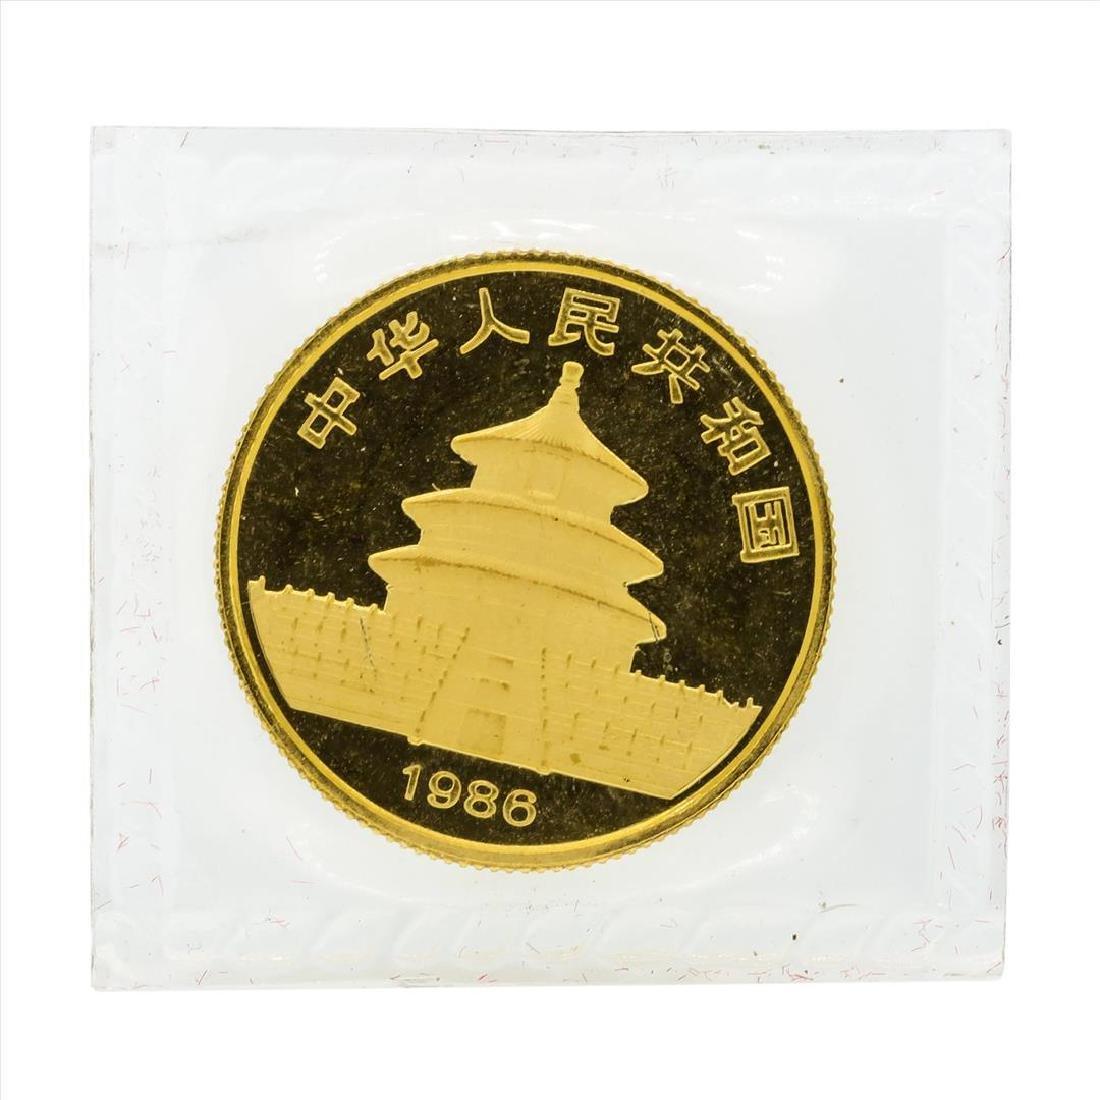 1986 25 Yuan China Panda 1/4 oz Gold Coin